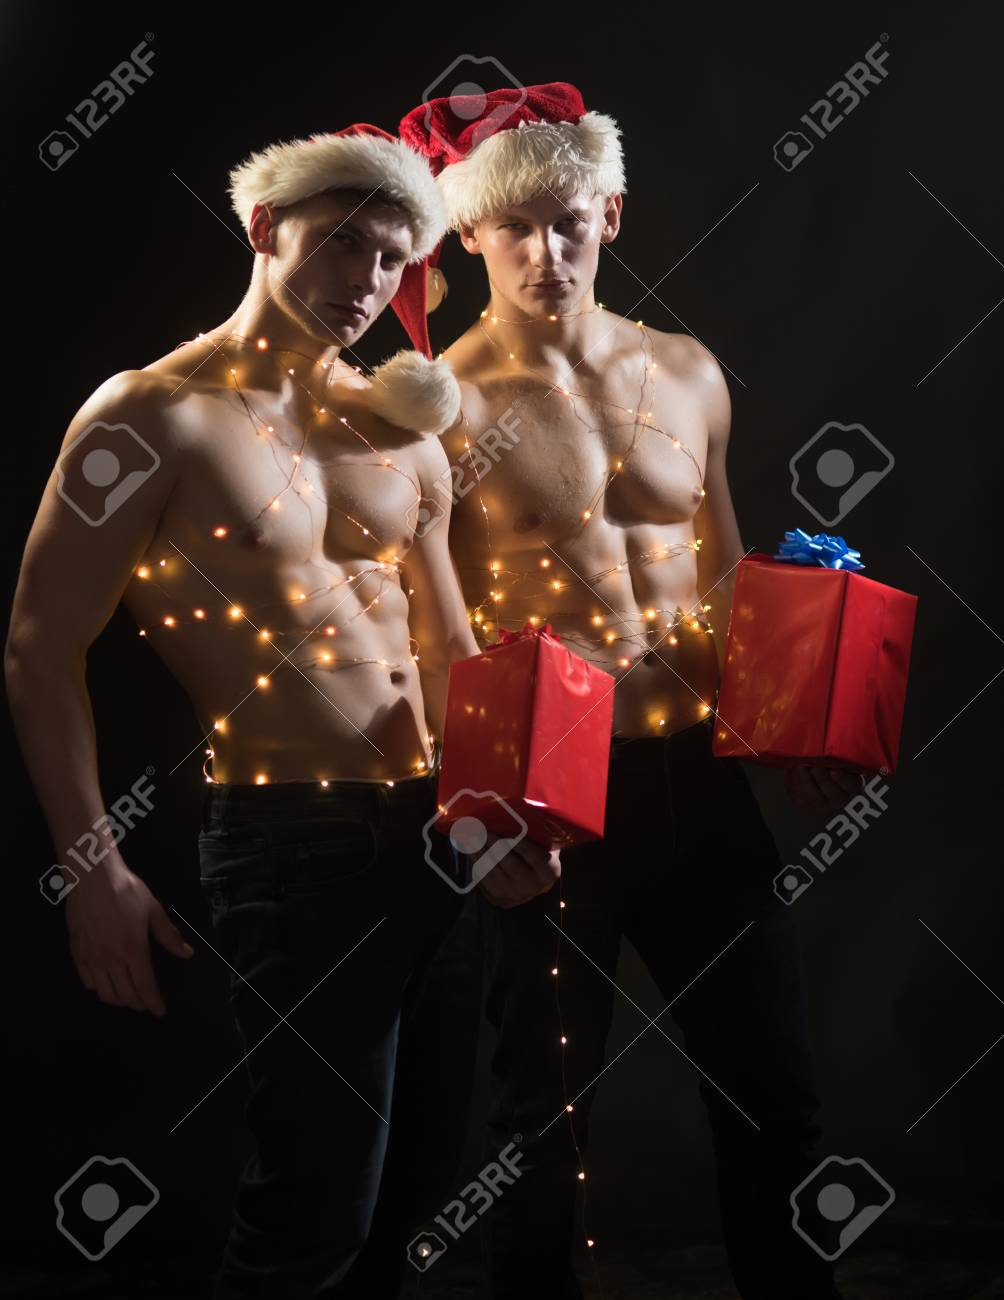 geschenke junge männer